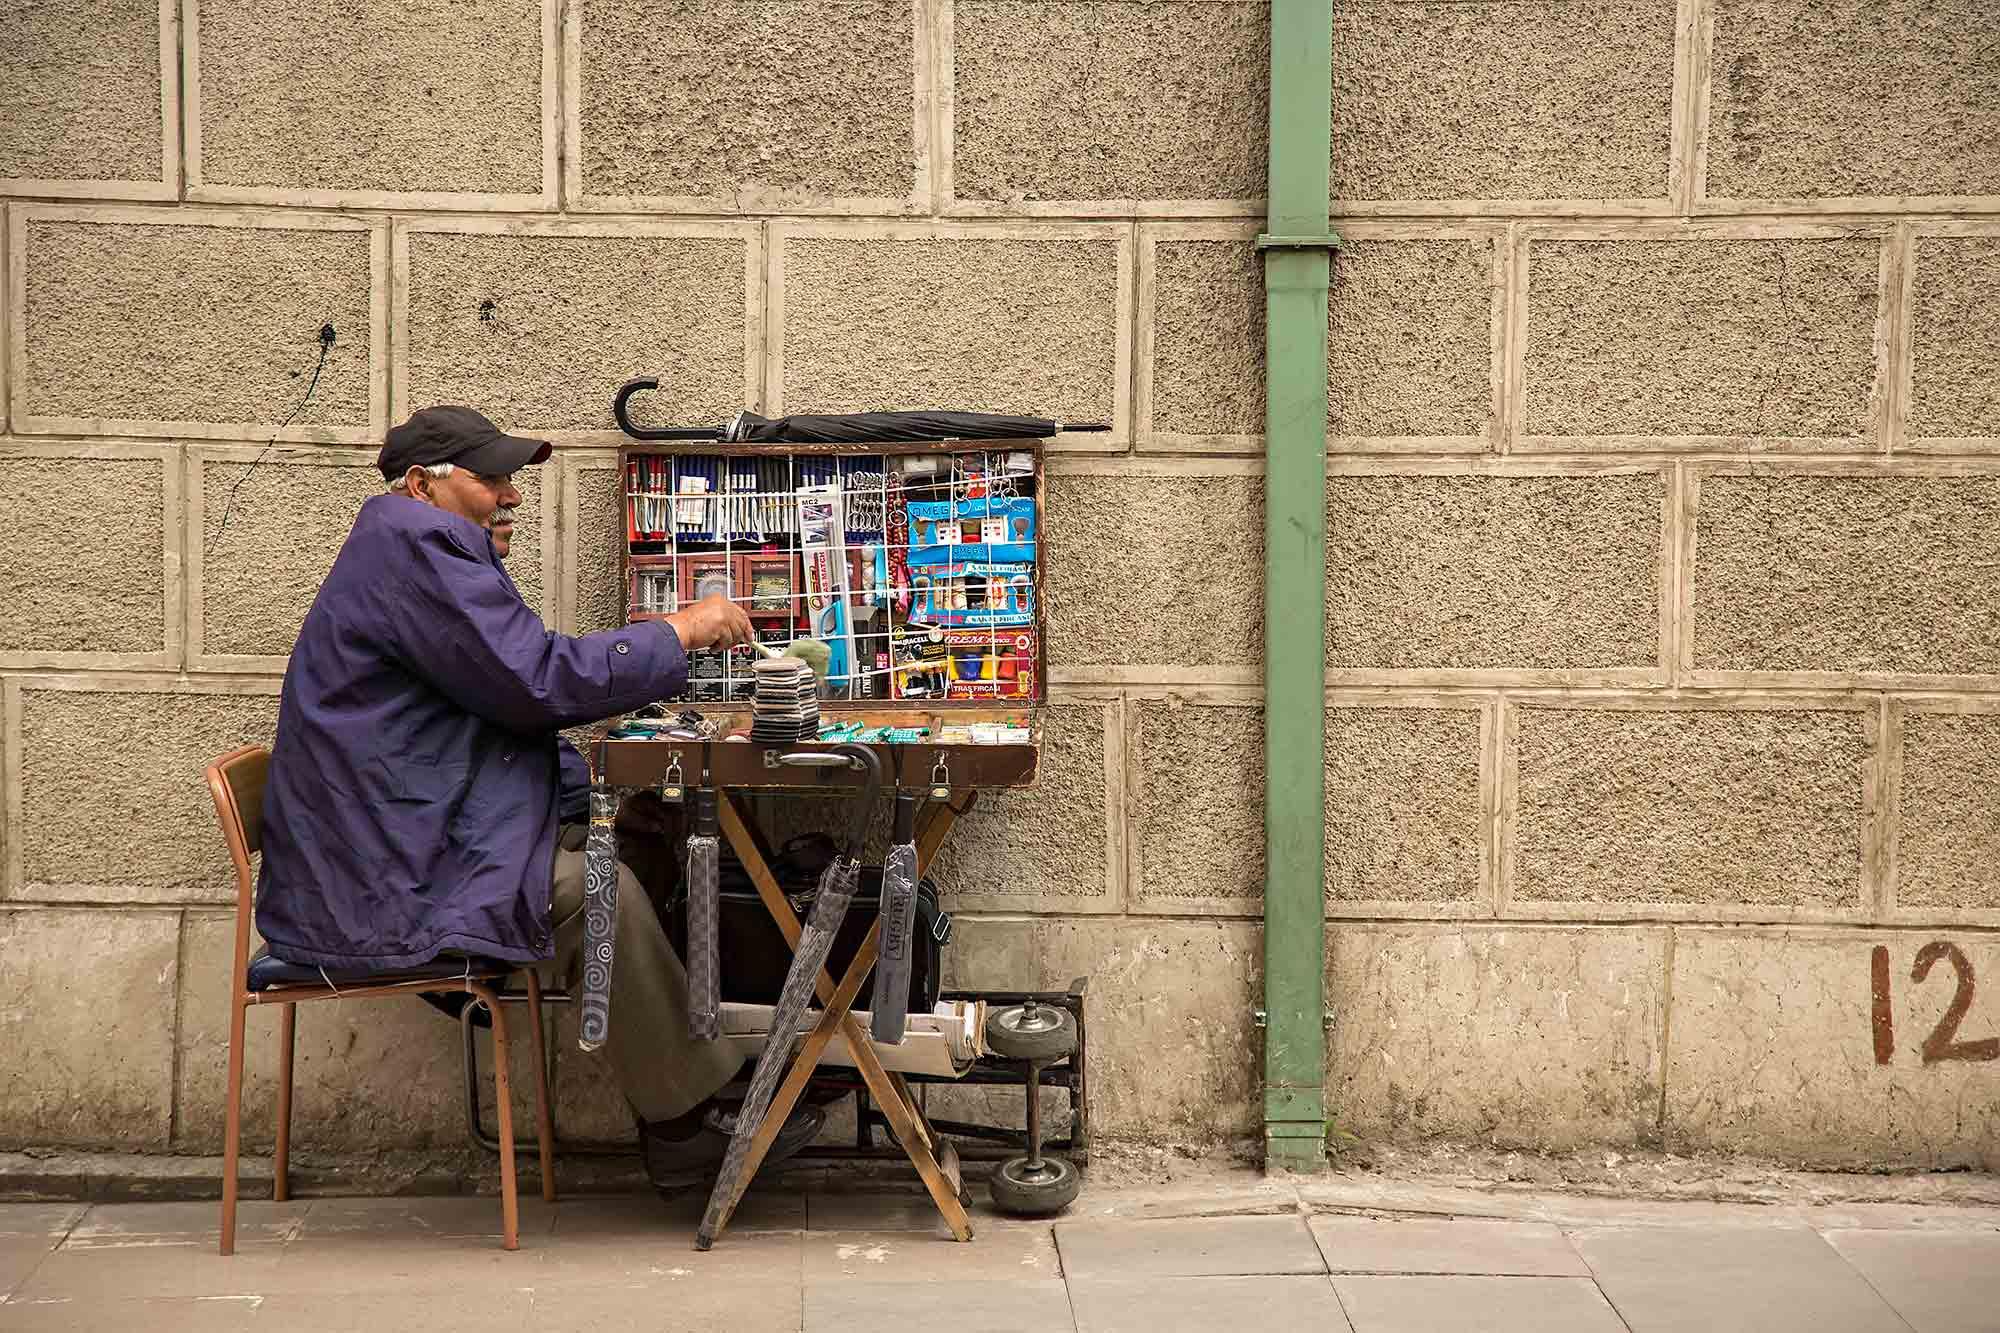 Street Vendor in Istanbul, Turkey. © Ulli Maier & Nisa Maier